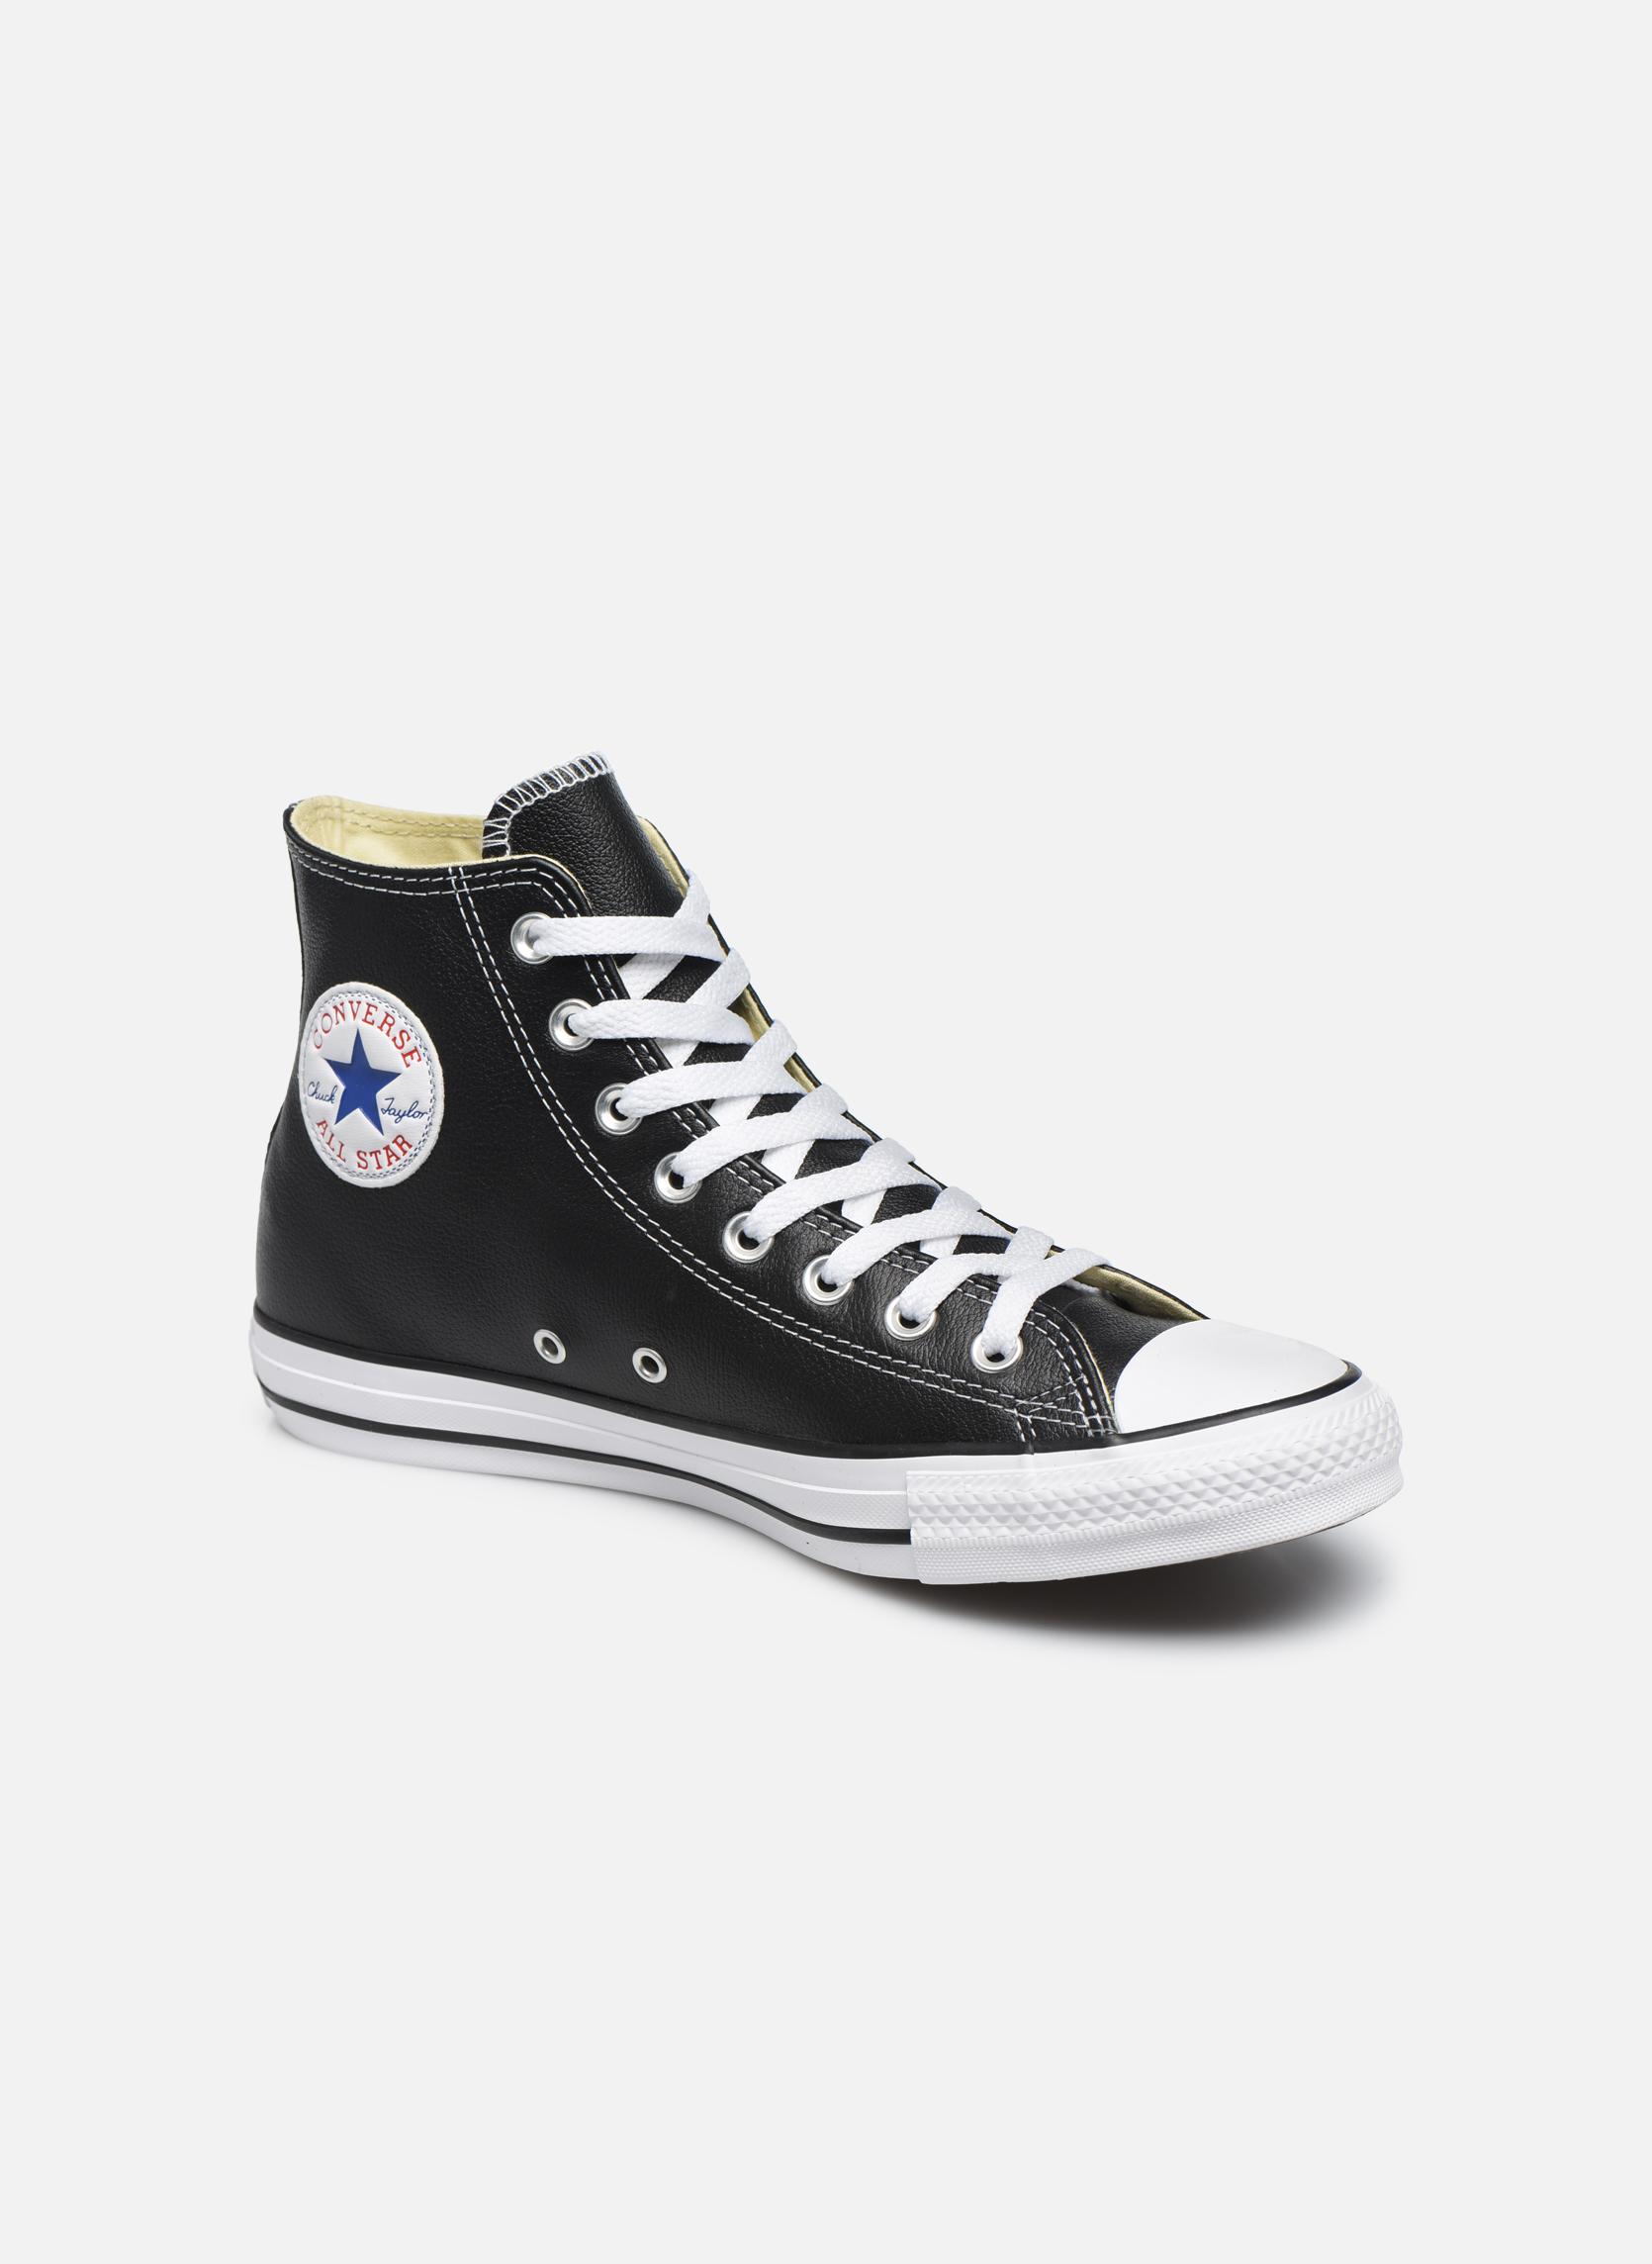 Sneaker Herren Chuck Taylor All Star Leather Hi M